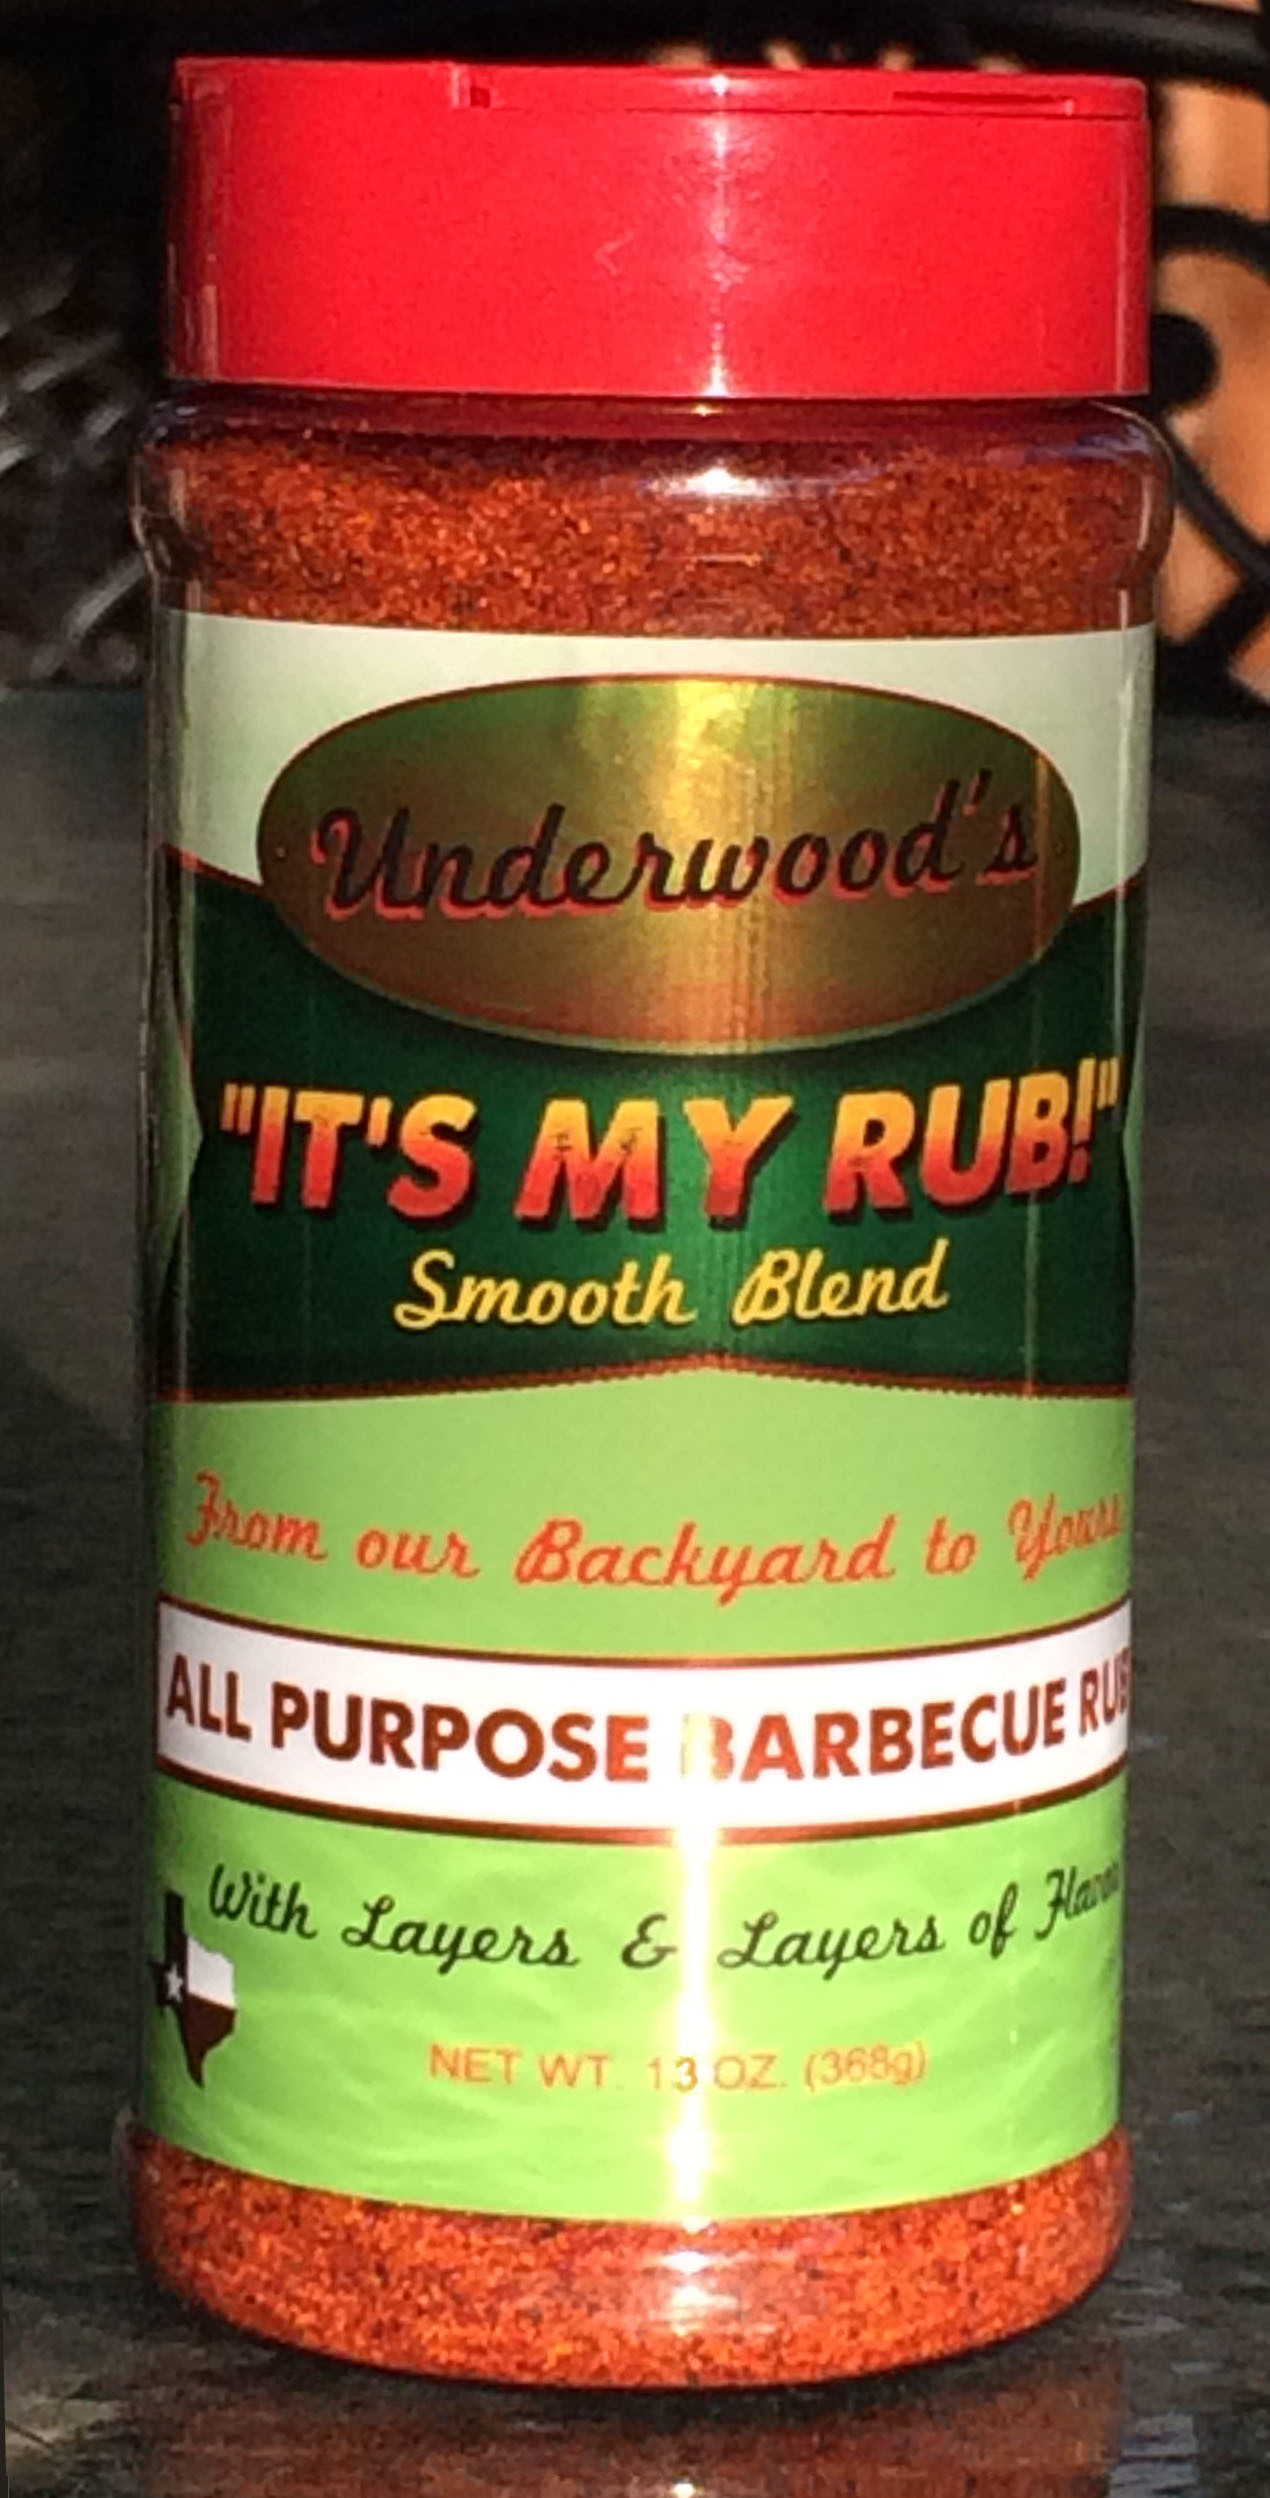 It's My Rub Smooth Blend - 16 oz. Bottle 7 42832 05027 2